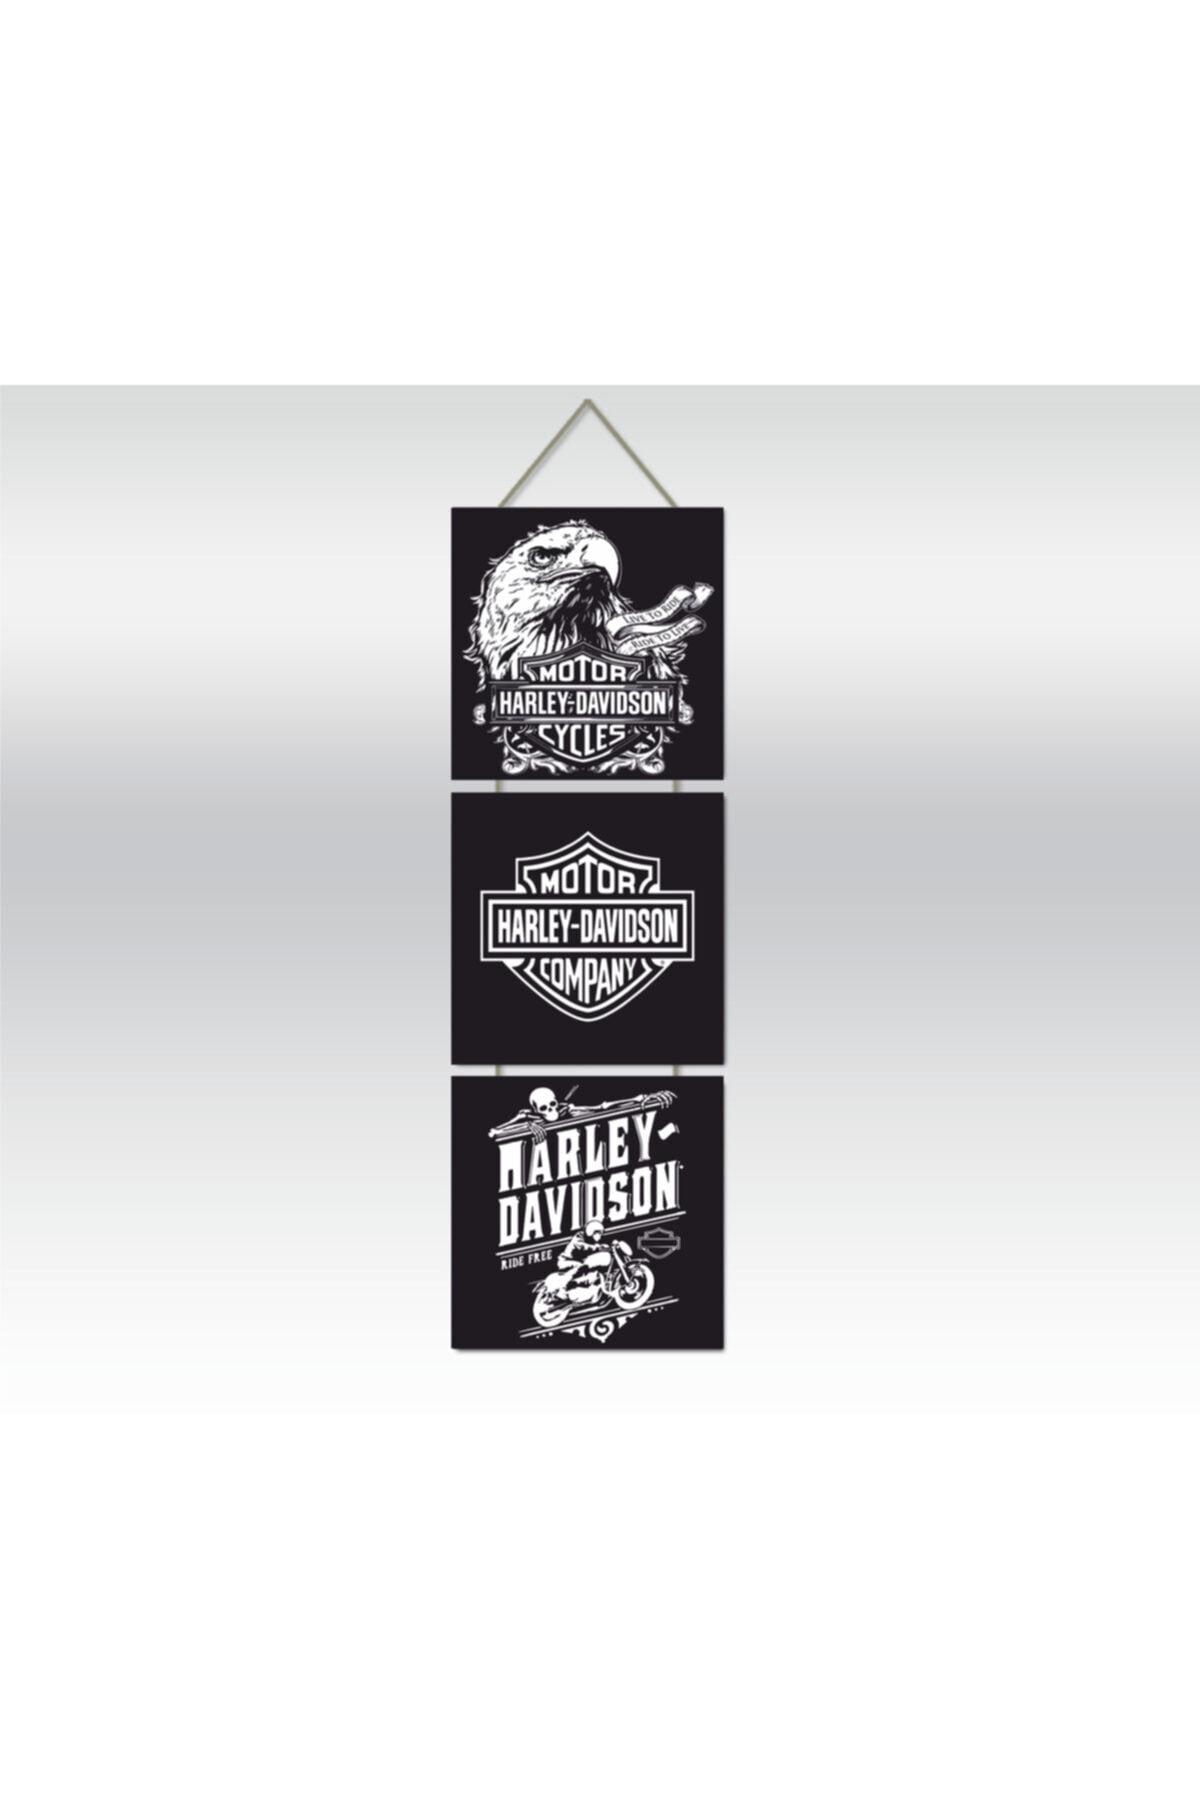 Harley Davidson Motorcycles Üçlü Retro Ahşap Poster